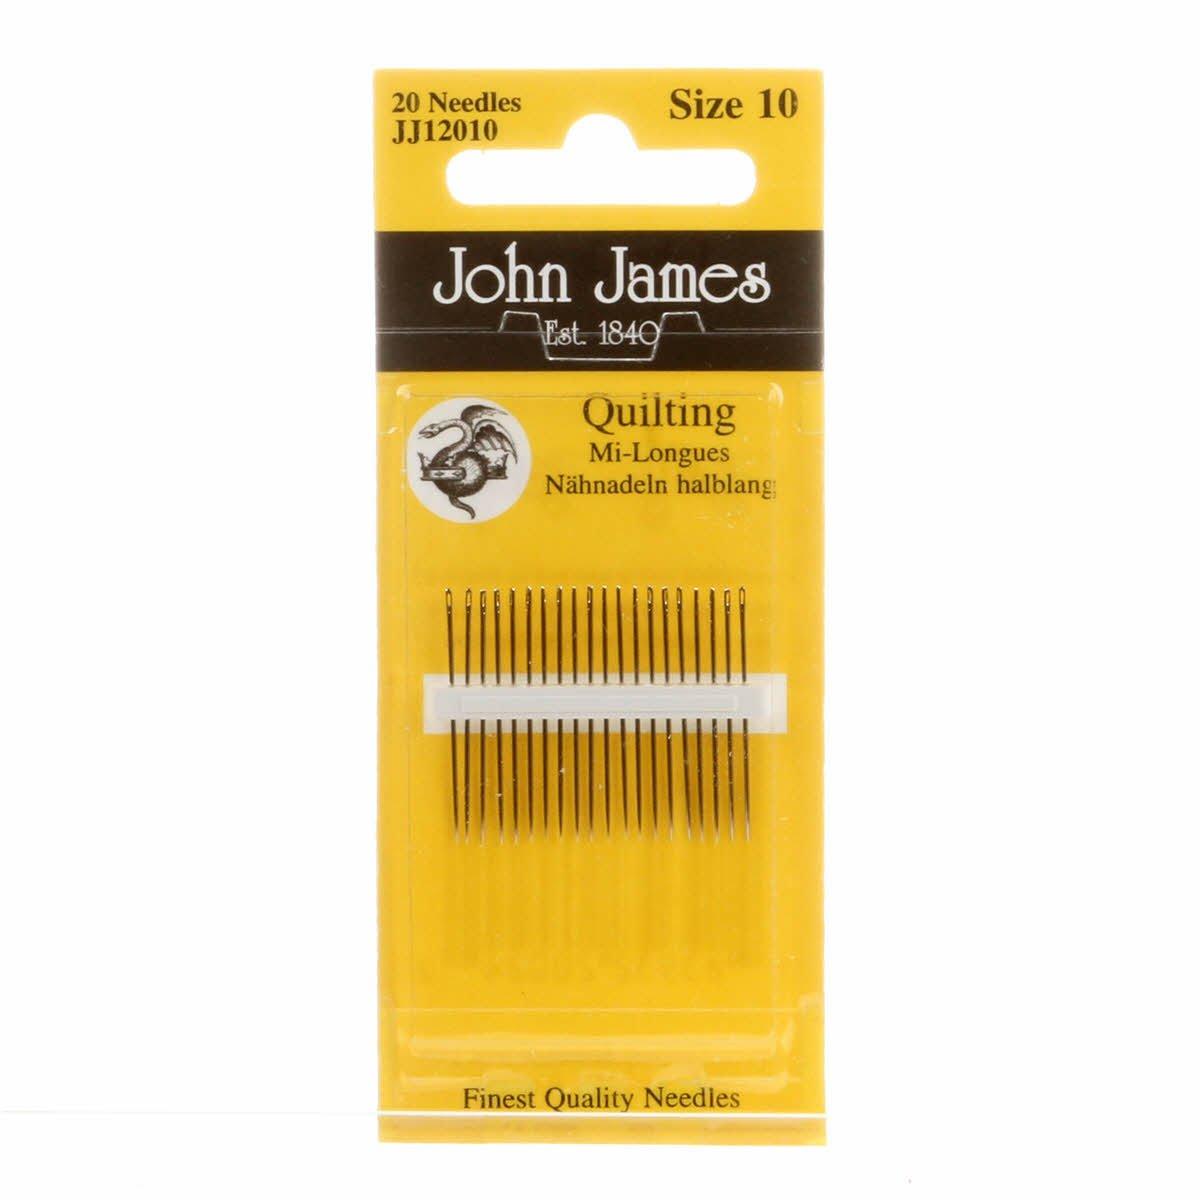 John James Gold Quilting Needles Sz 10 - 6 needles